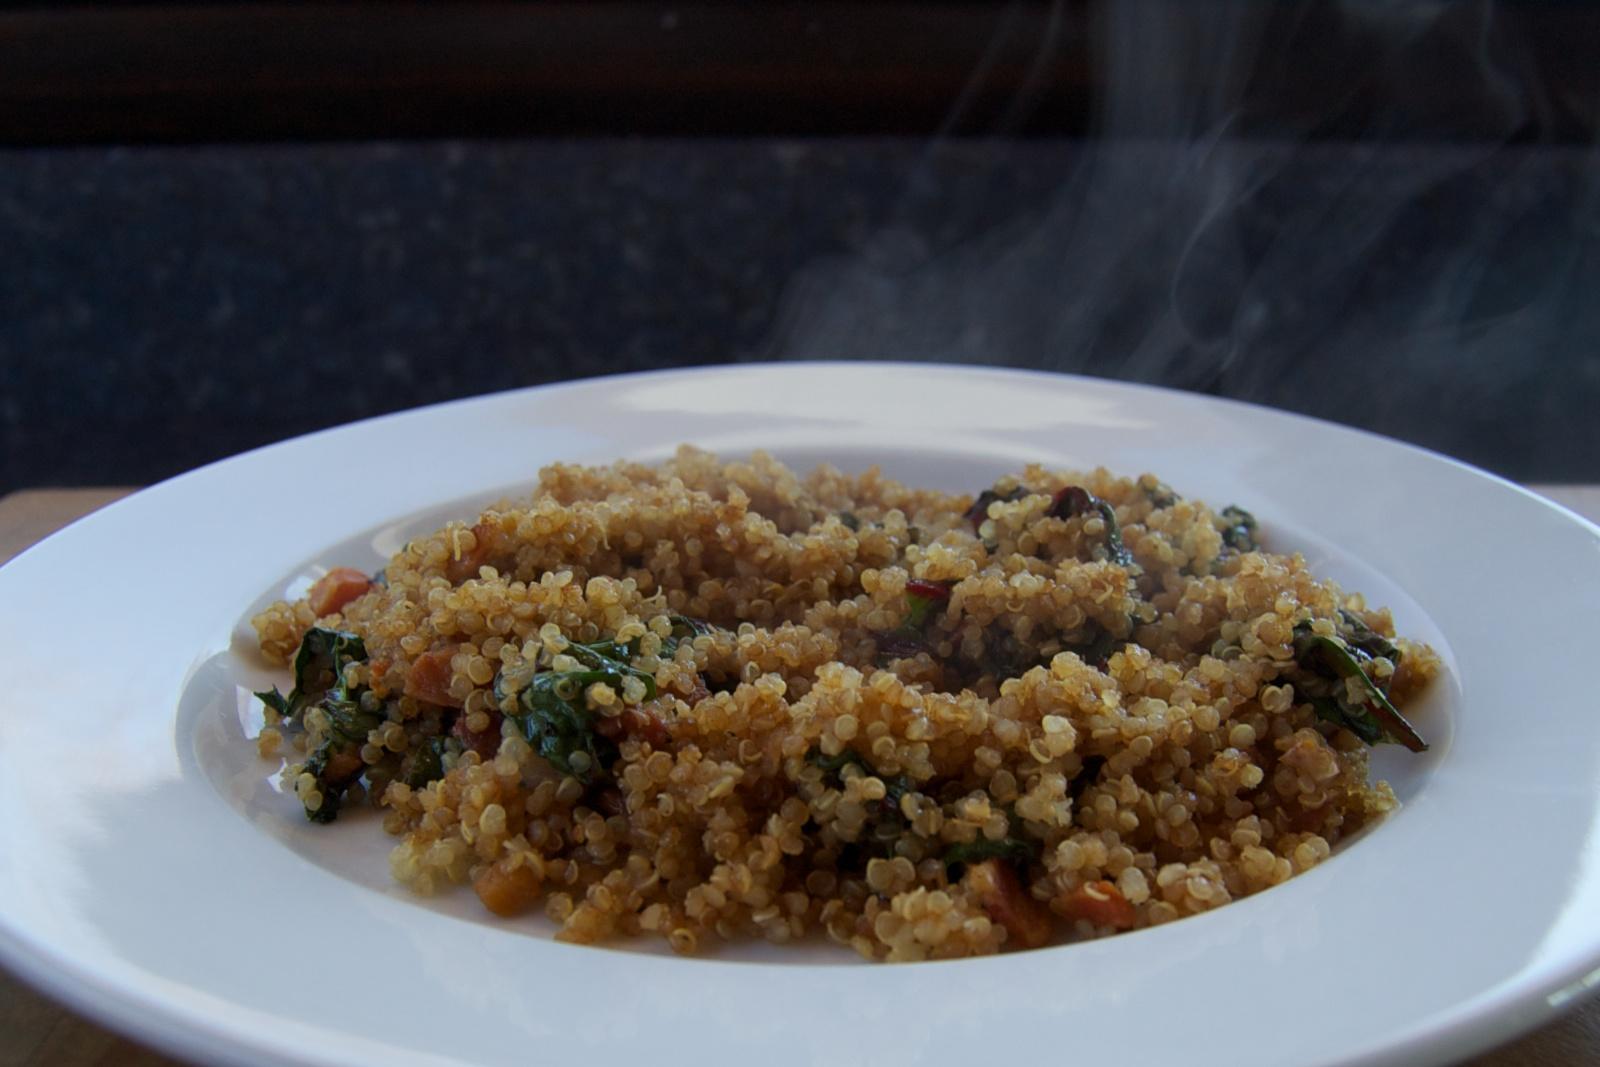 http://blog.rickk.com/food/2013/01/27/ate.2013.01.27.l.jpg